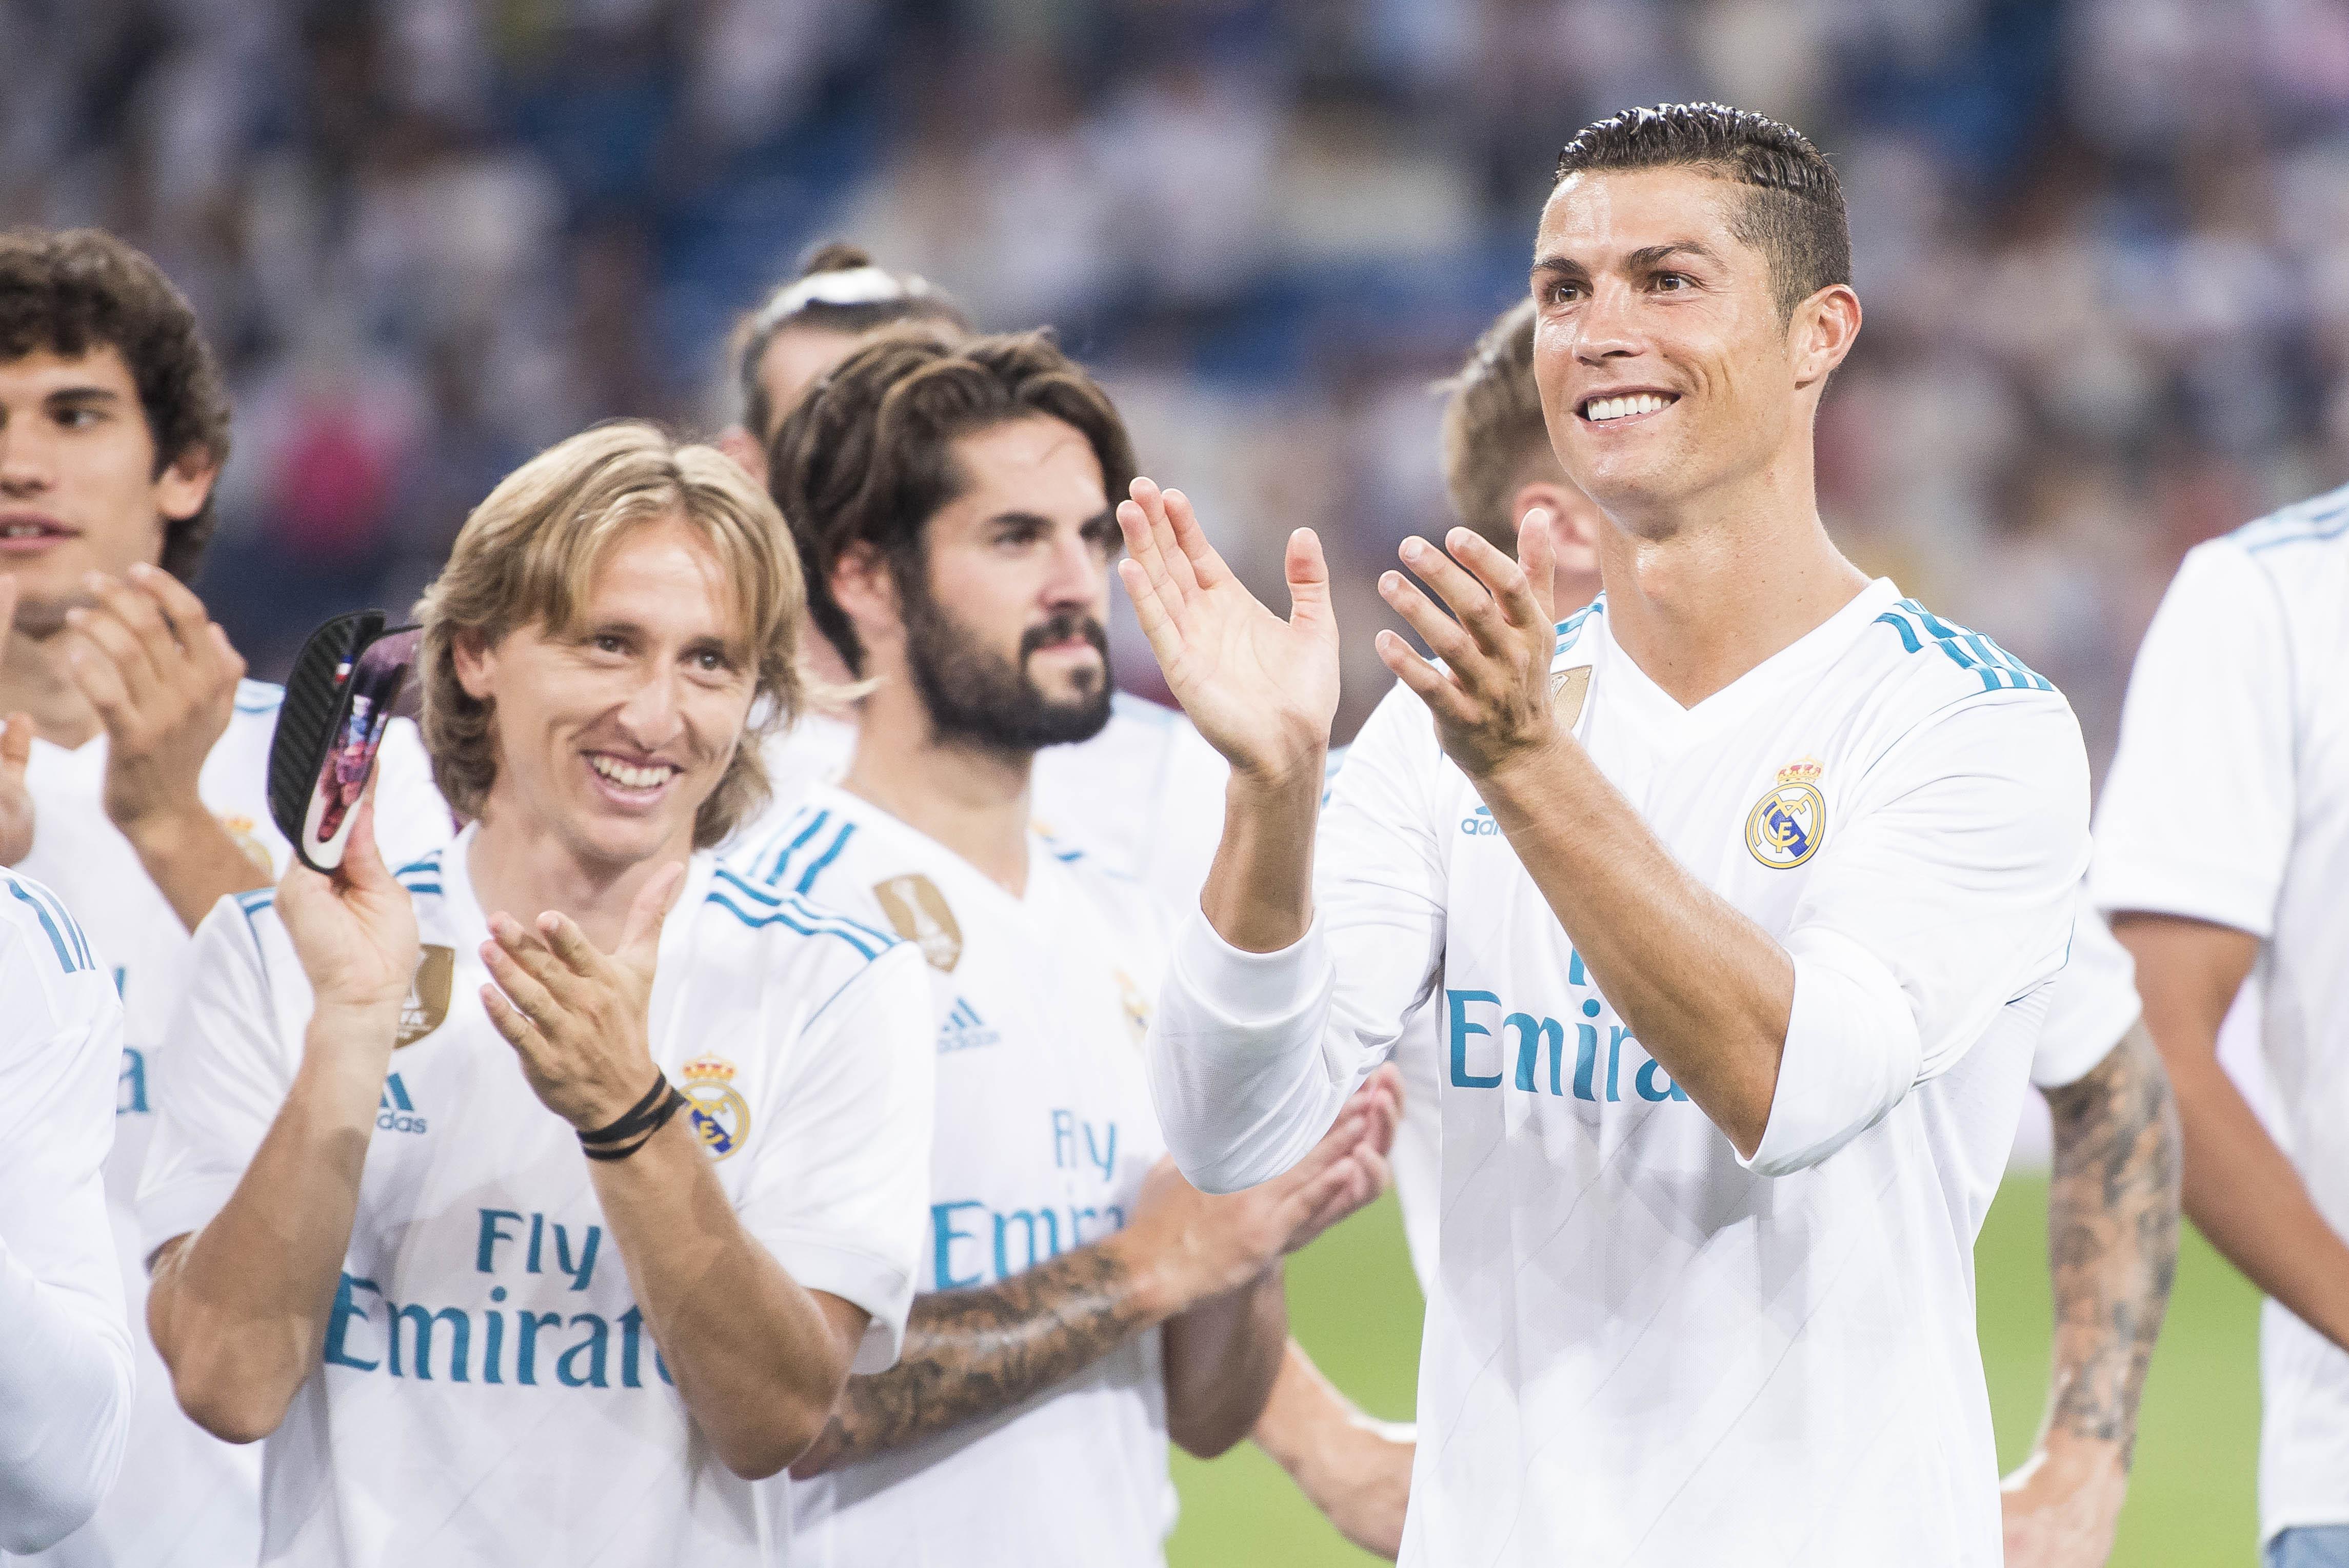 Modric and Ronaldo in celebratory mood. Image: PA